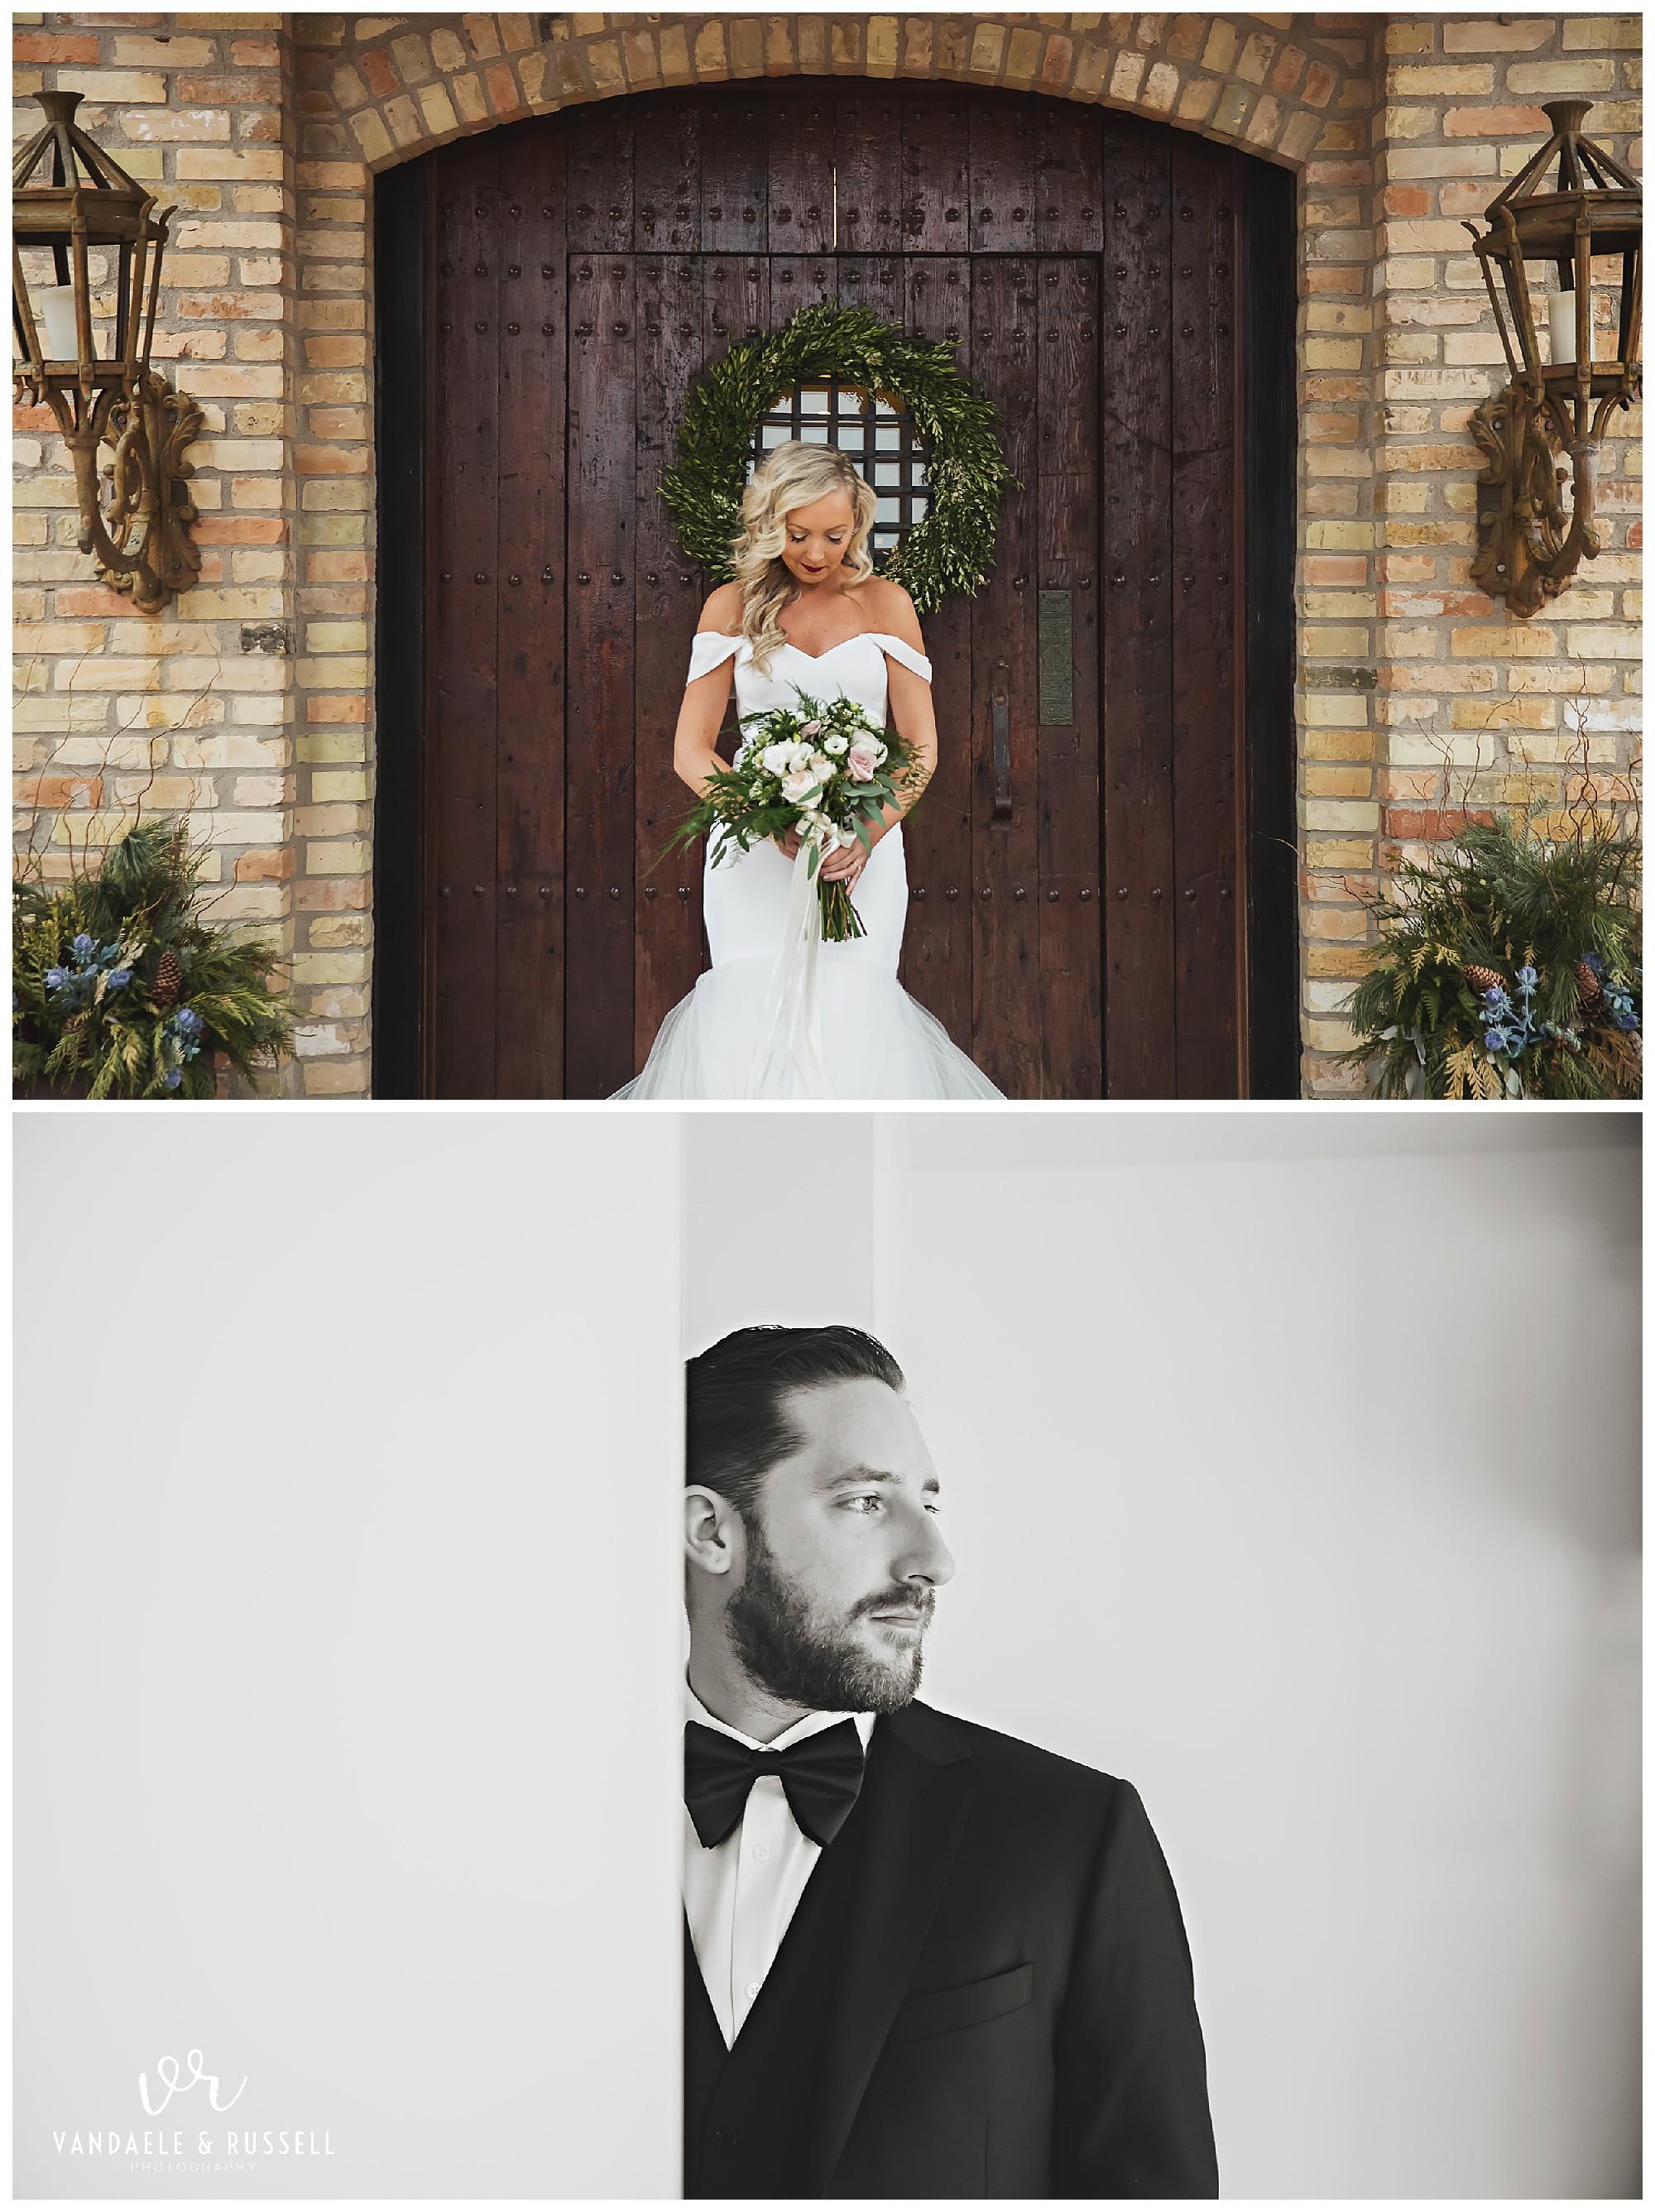 Hacienda-Sarria-Wedding-Photos-NYE-Michelle-Matt-VanDaele-Russell_0007.jpg